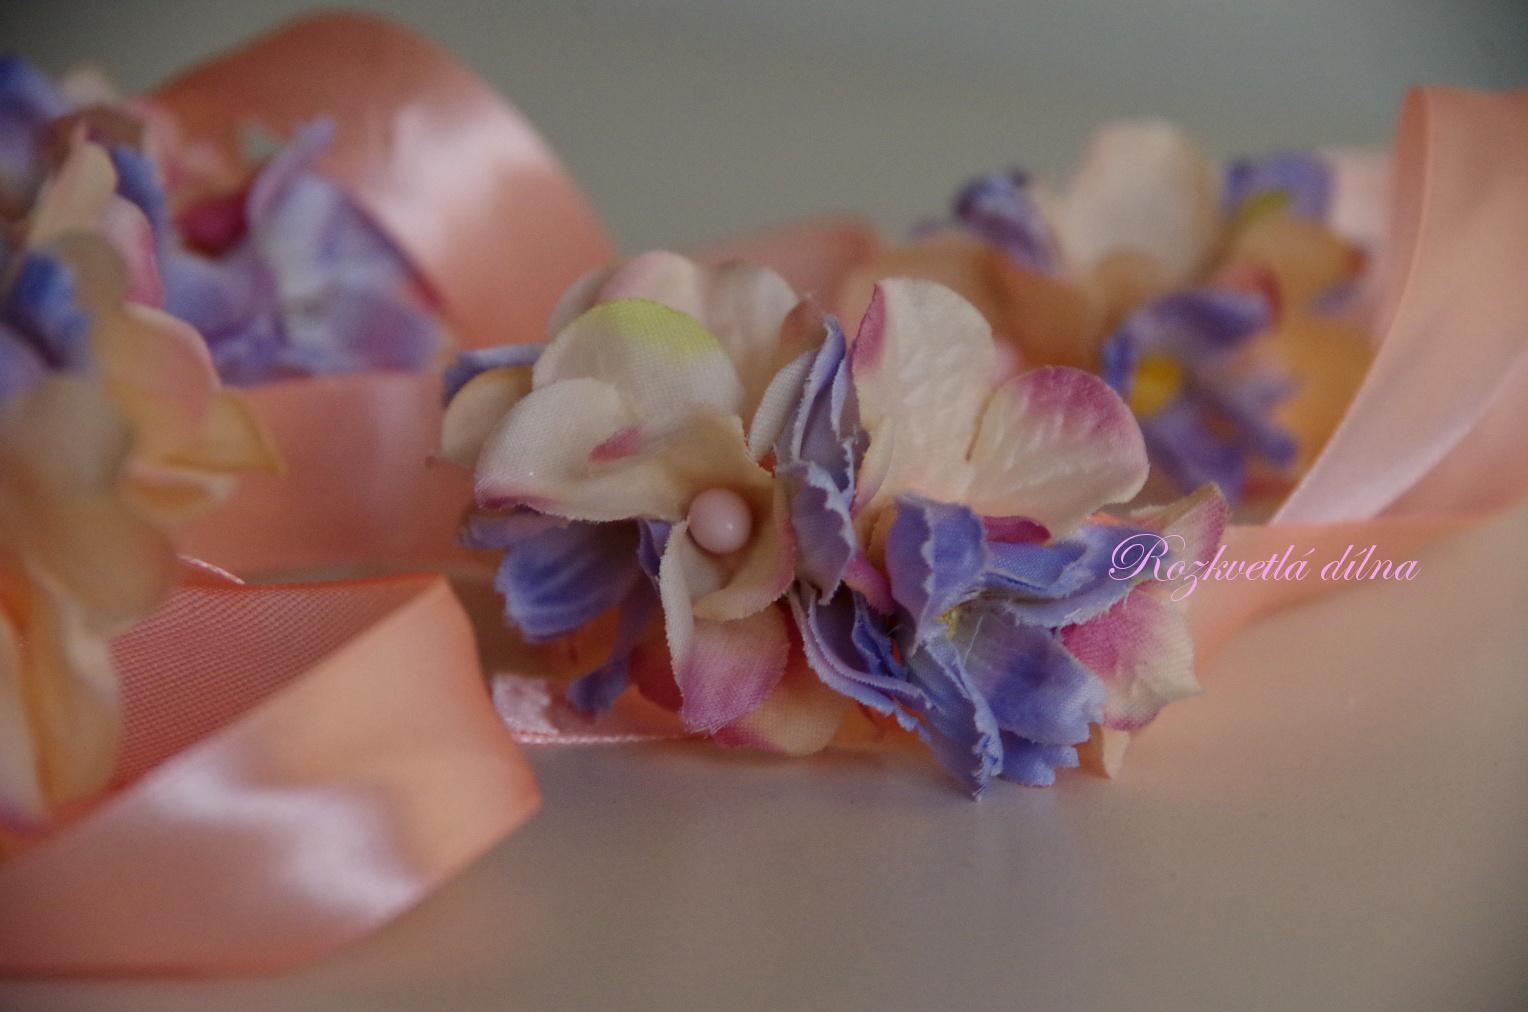 Náramek modro-růžový - Obrázek č. 1